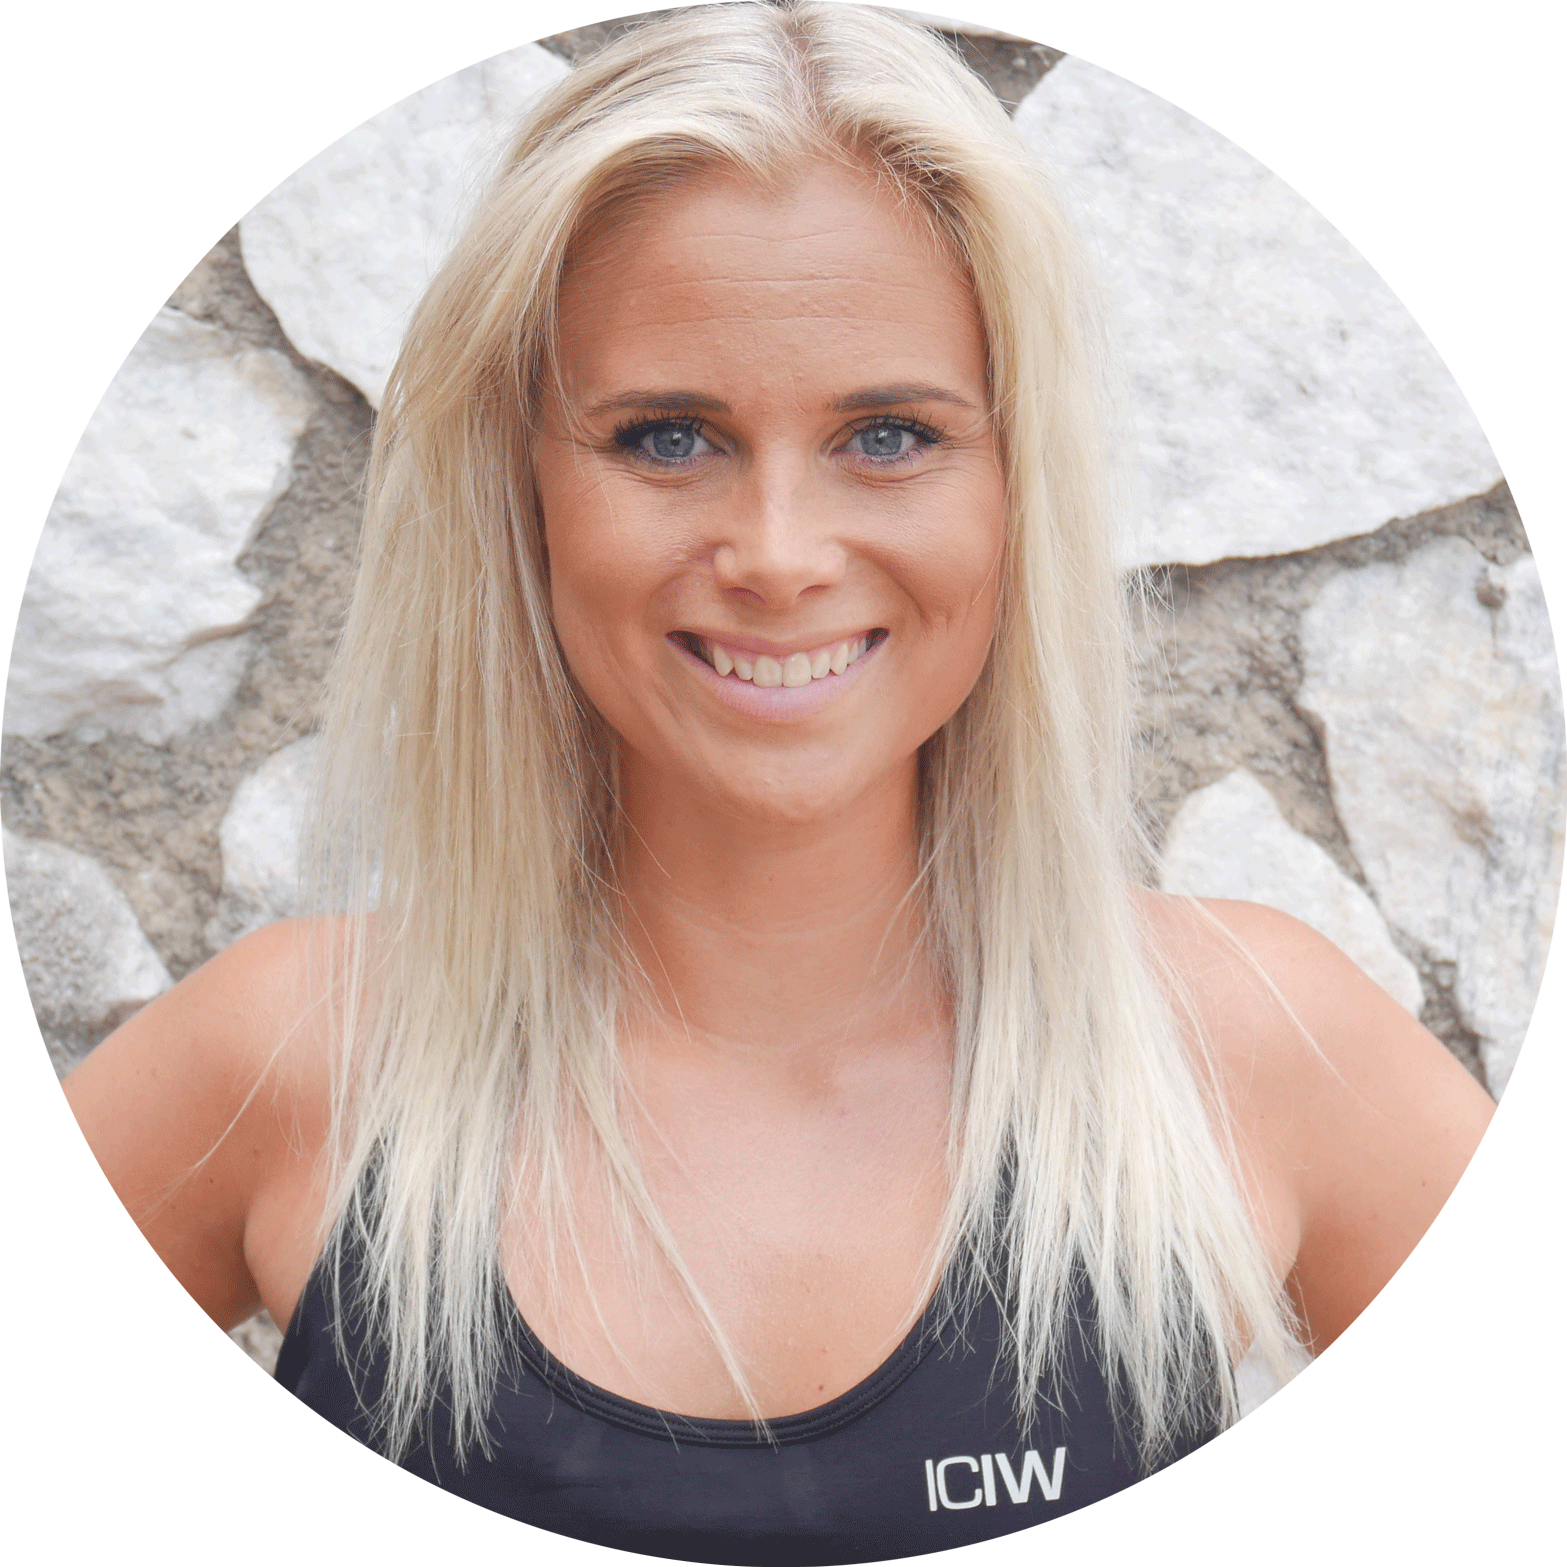 Maya Lützhøft - Personal trainer, dietician and nurse